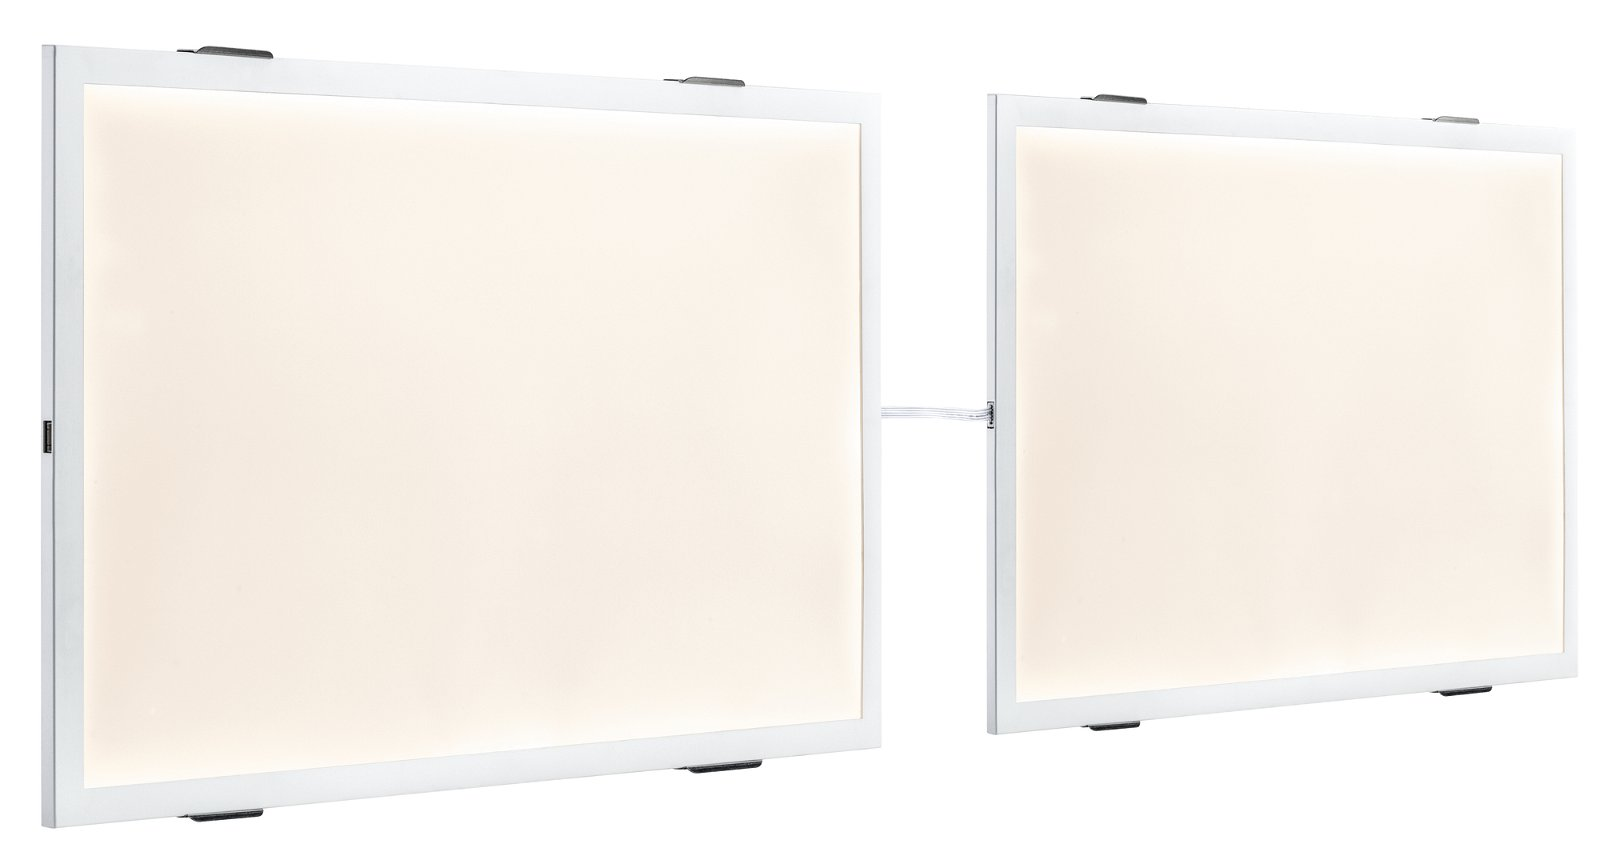 LED Panel Glow 8W Weiß Warmweiß Erweiterung